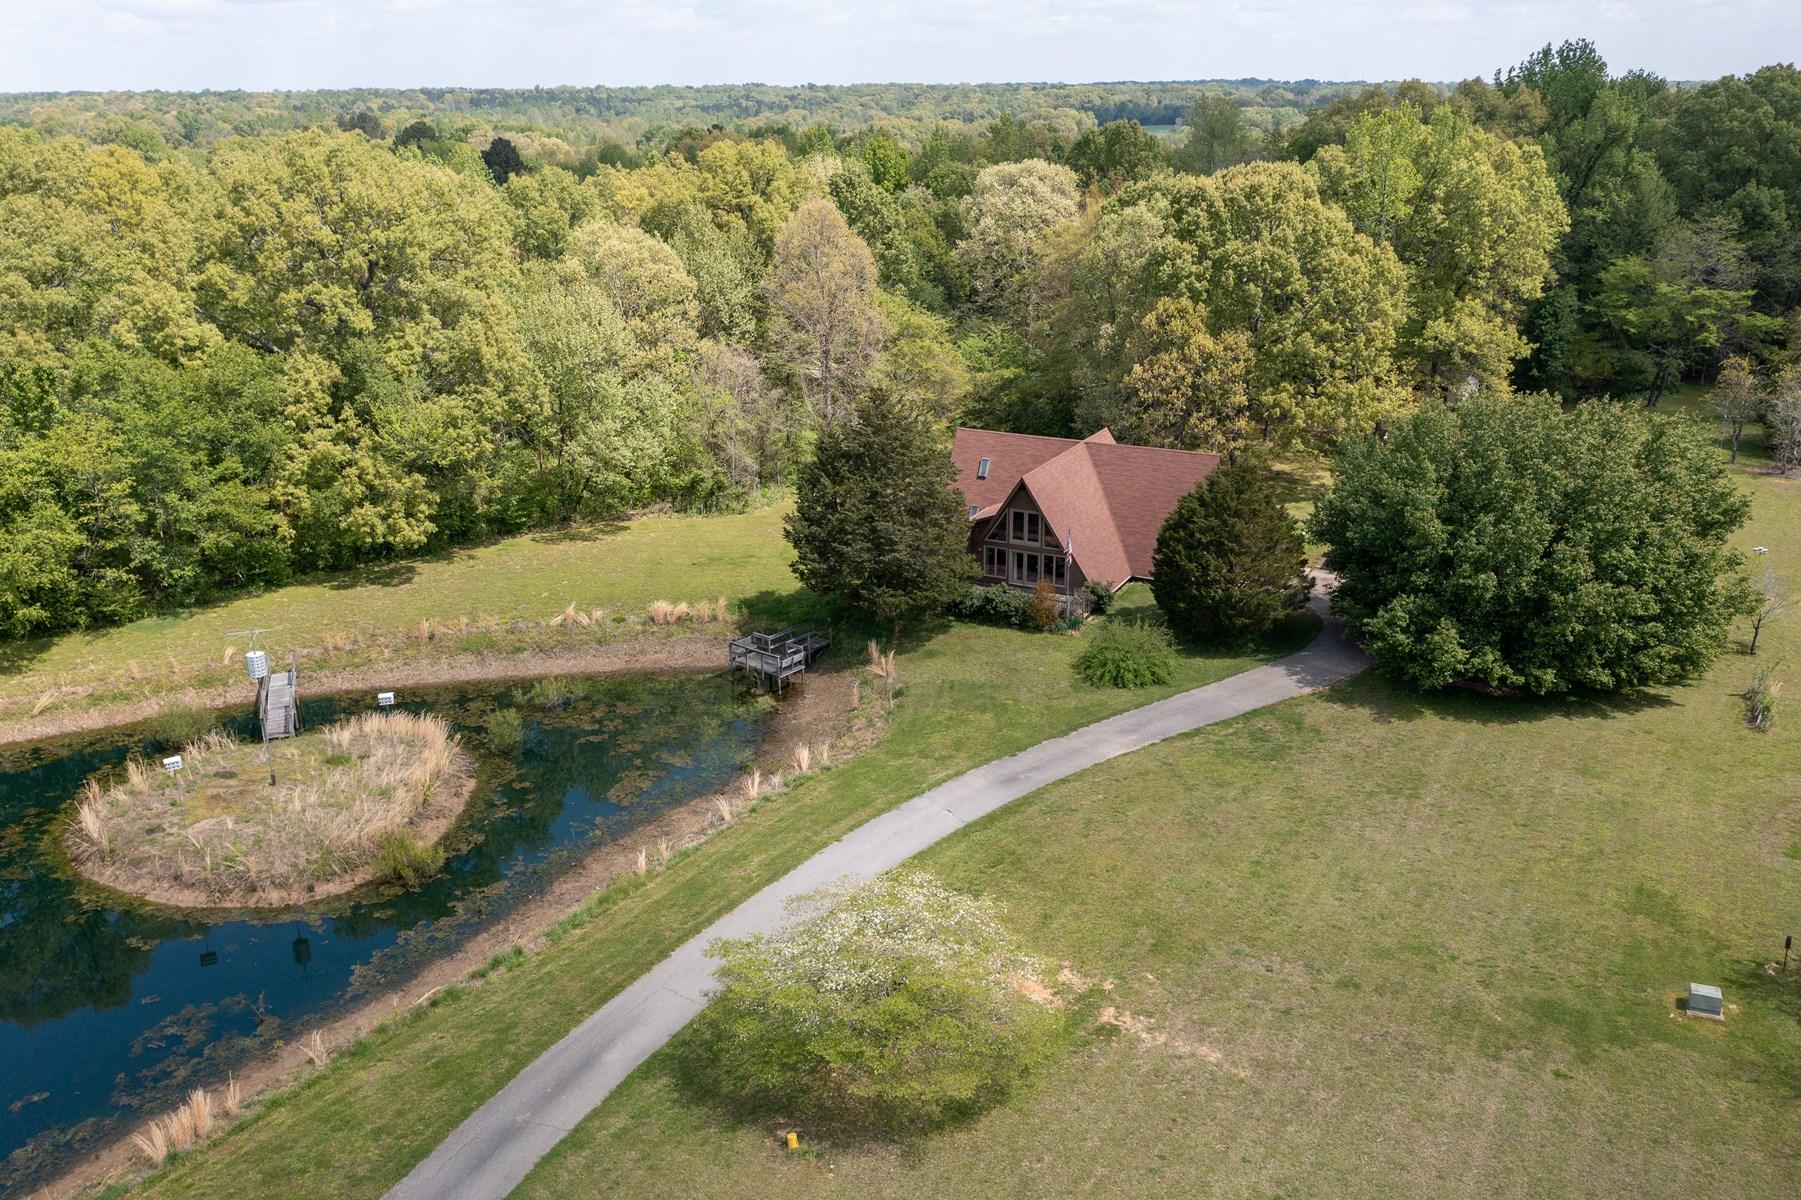 A-Frame with Acreage, Ponds & Decks For Sale near Jackson TN